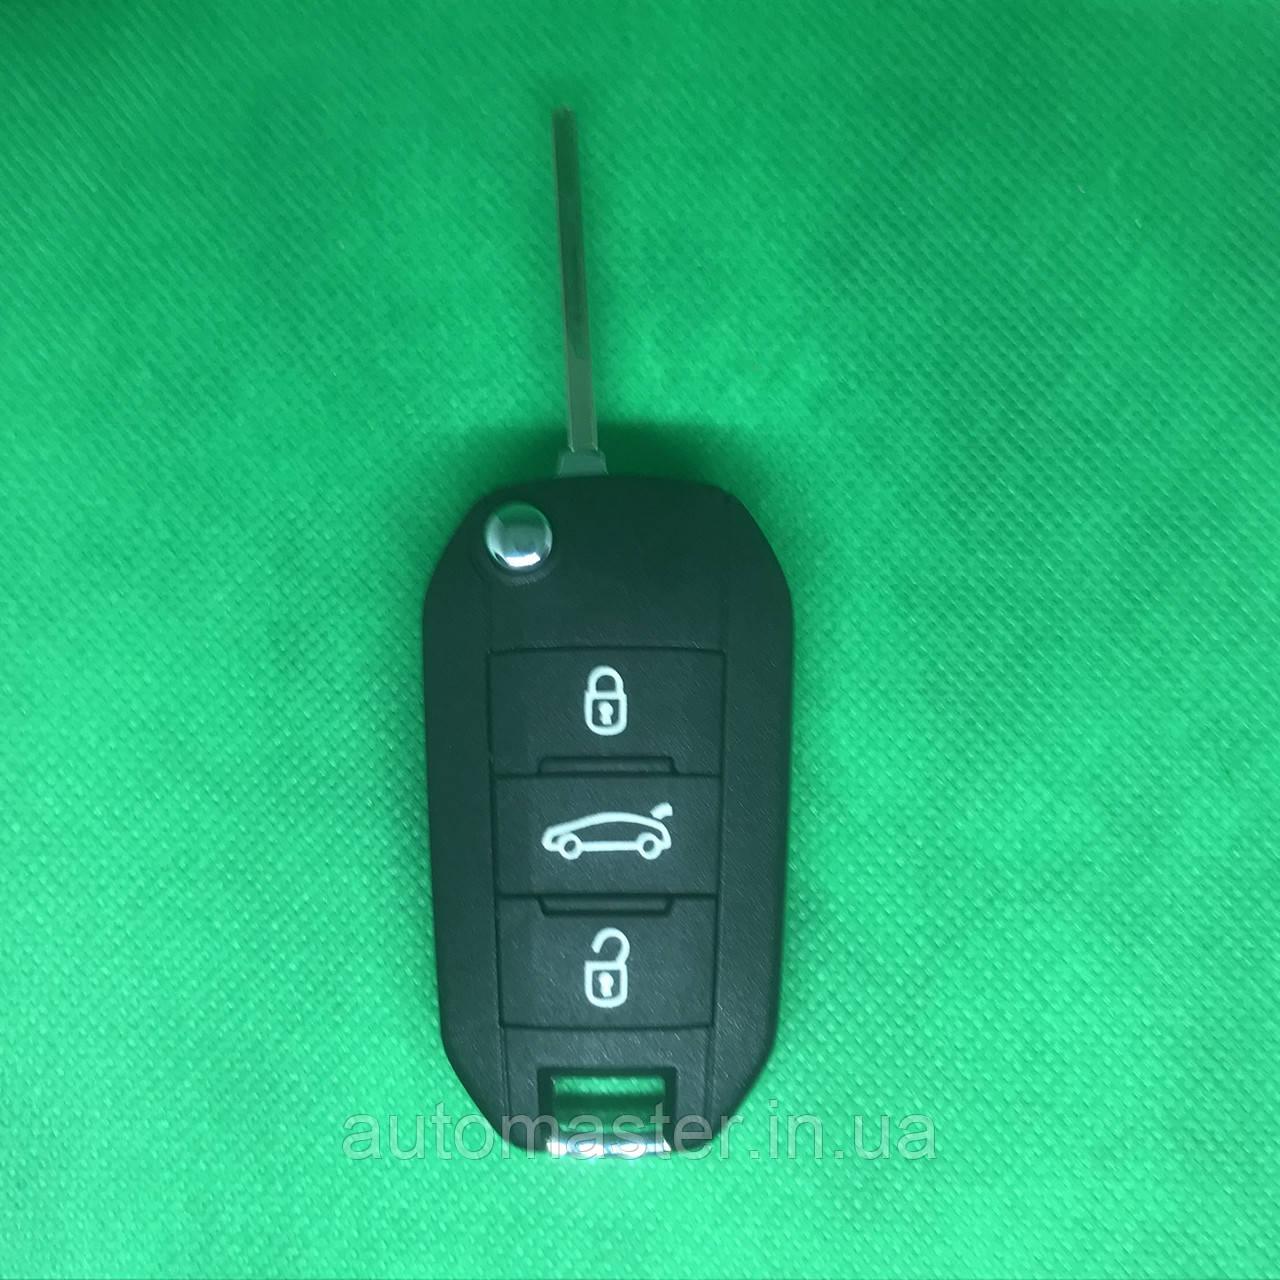 Ключ для PEUGEOT (Пежо) 508 3 - кнопки с чипом ID46/433MHZ